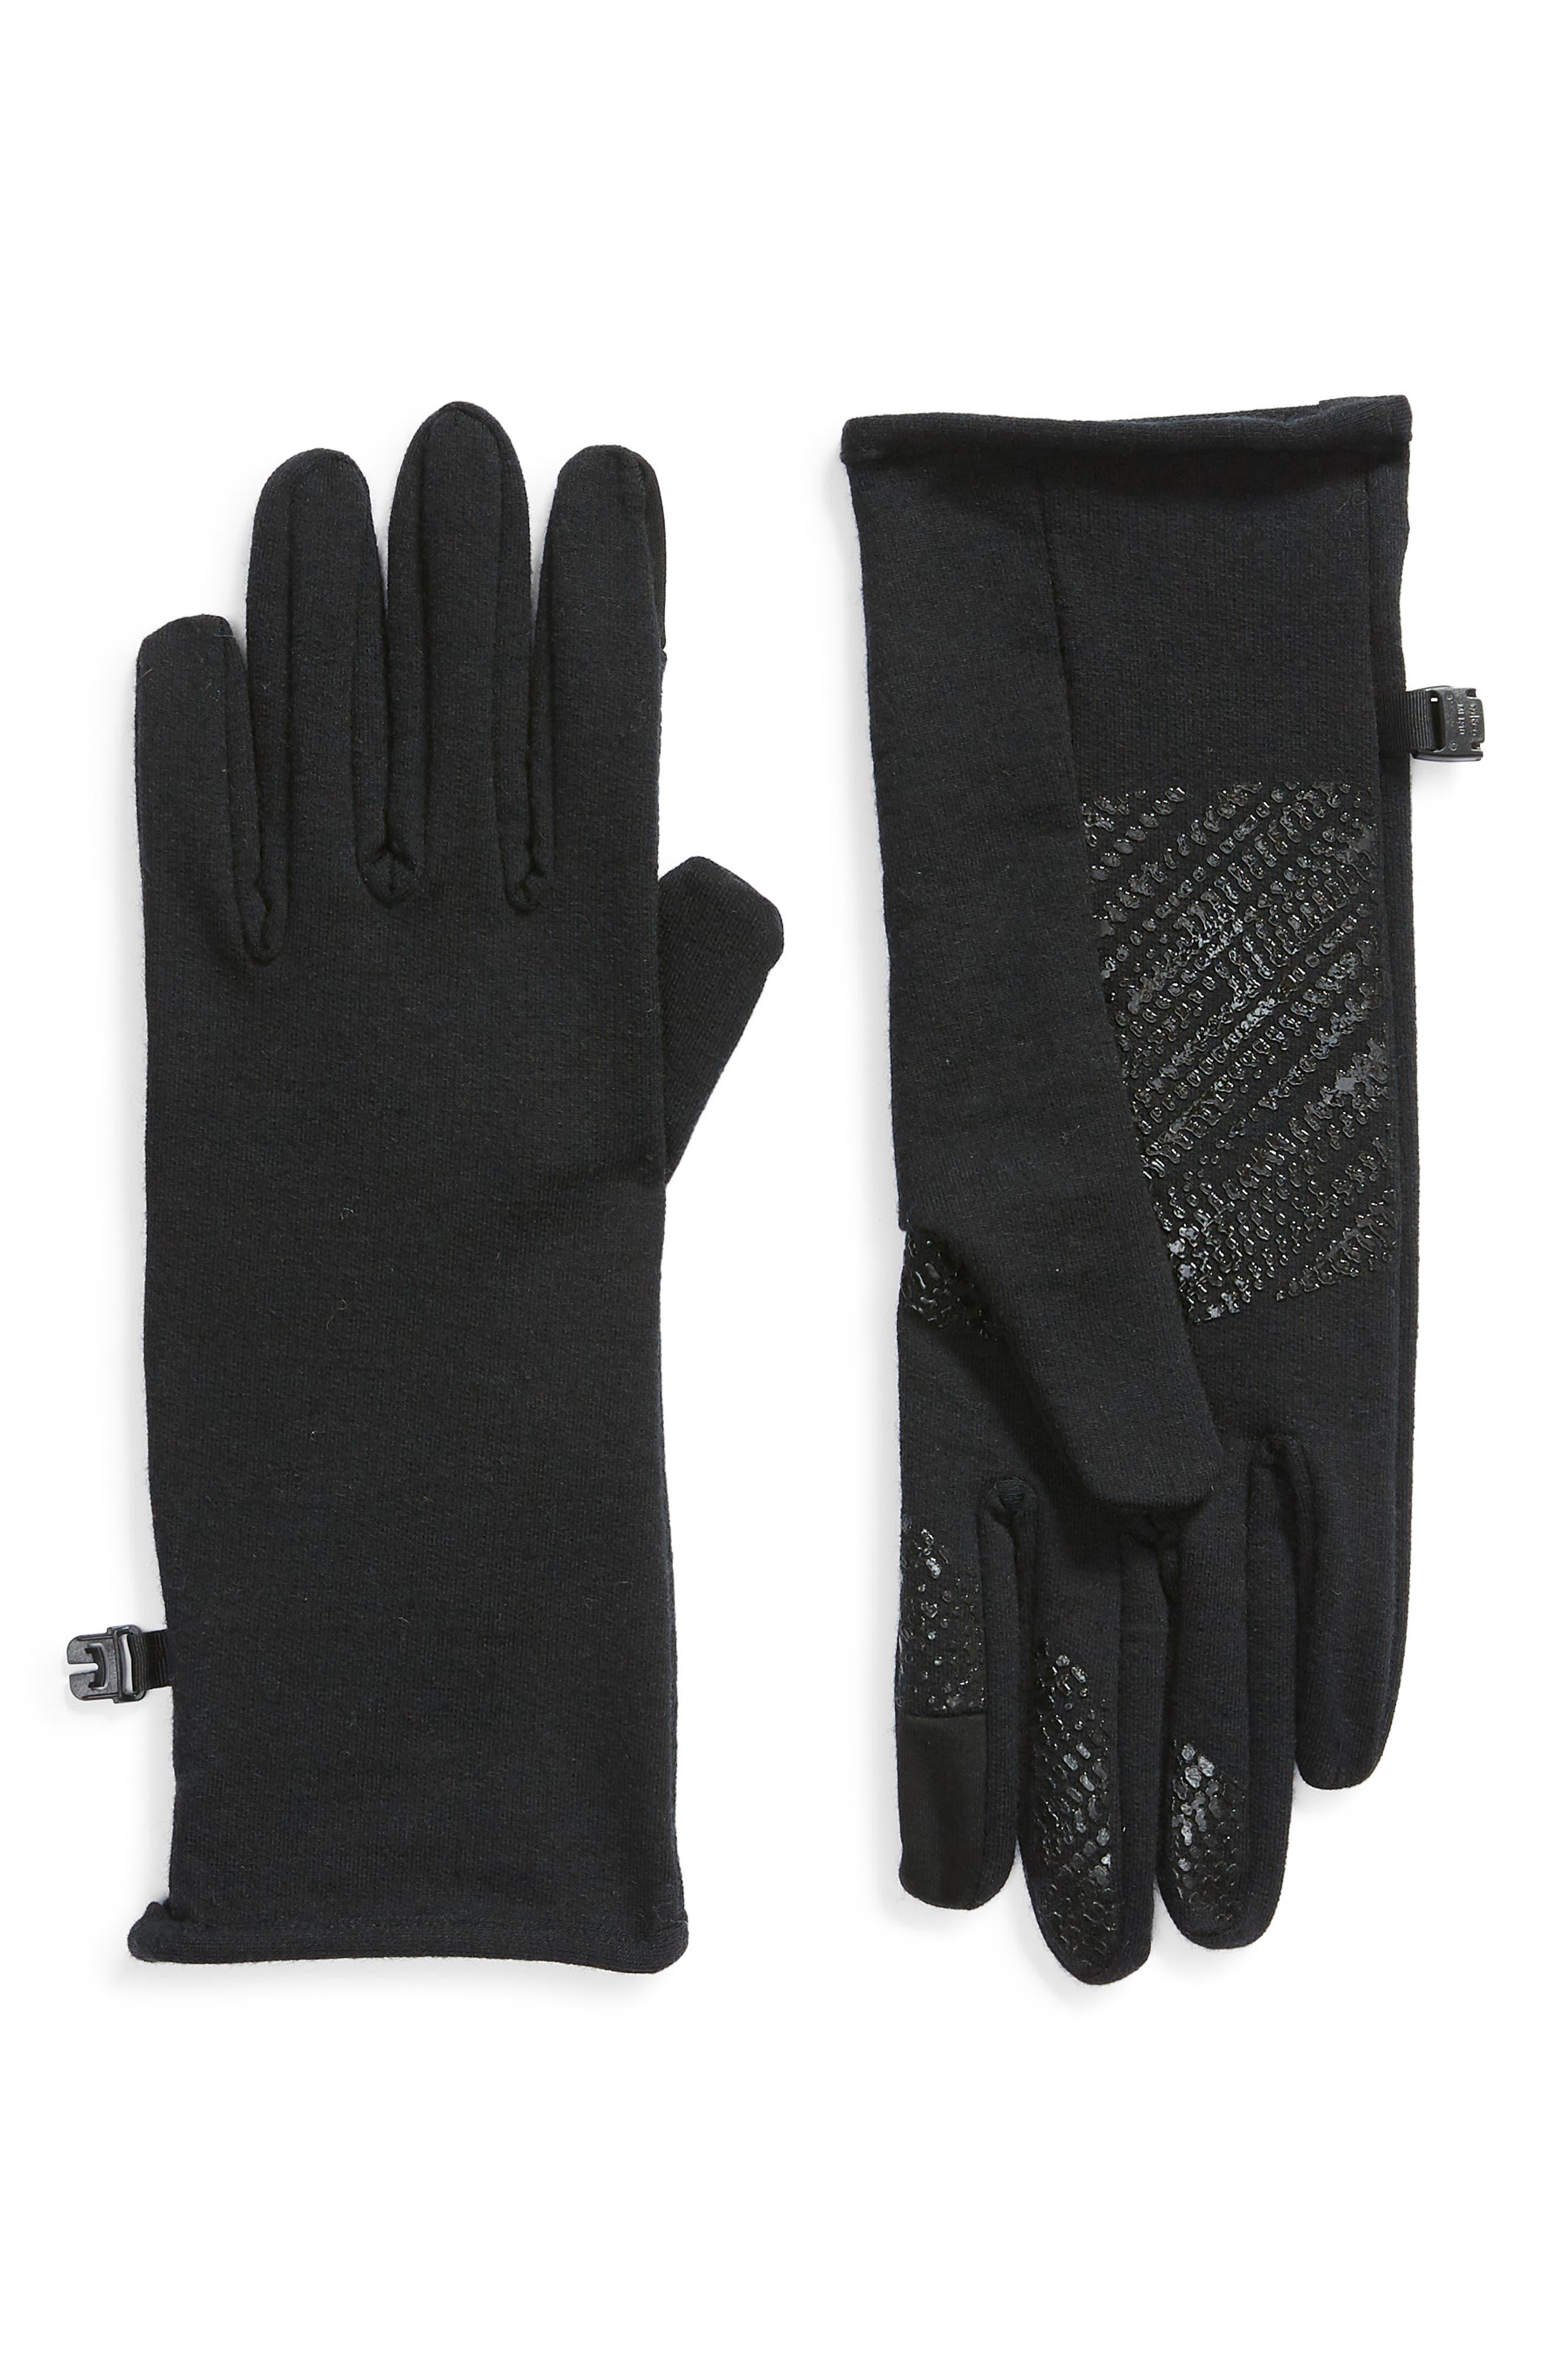 Quantum Touchscreen Compatible Merino Wool Gloves